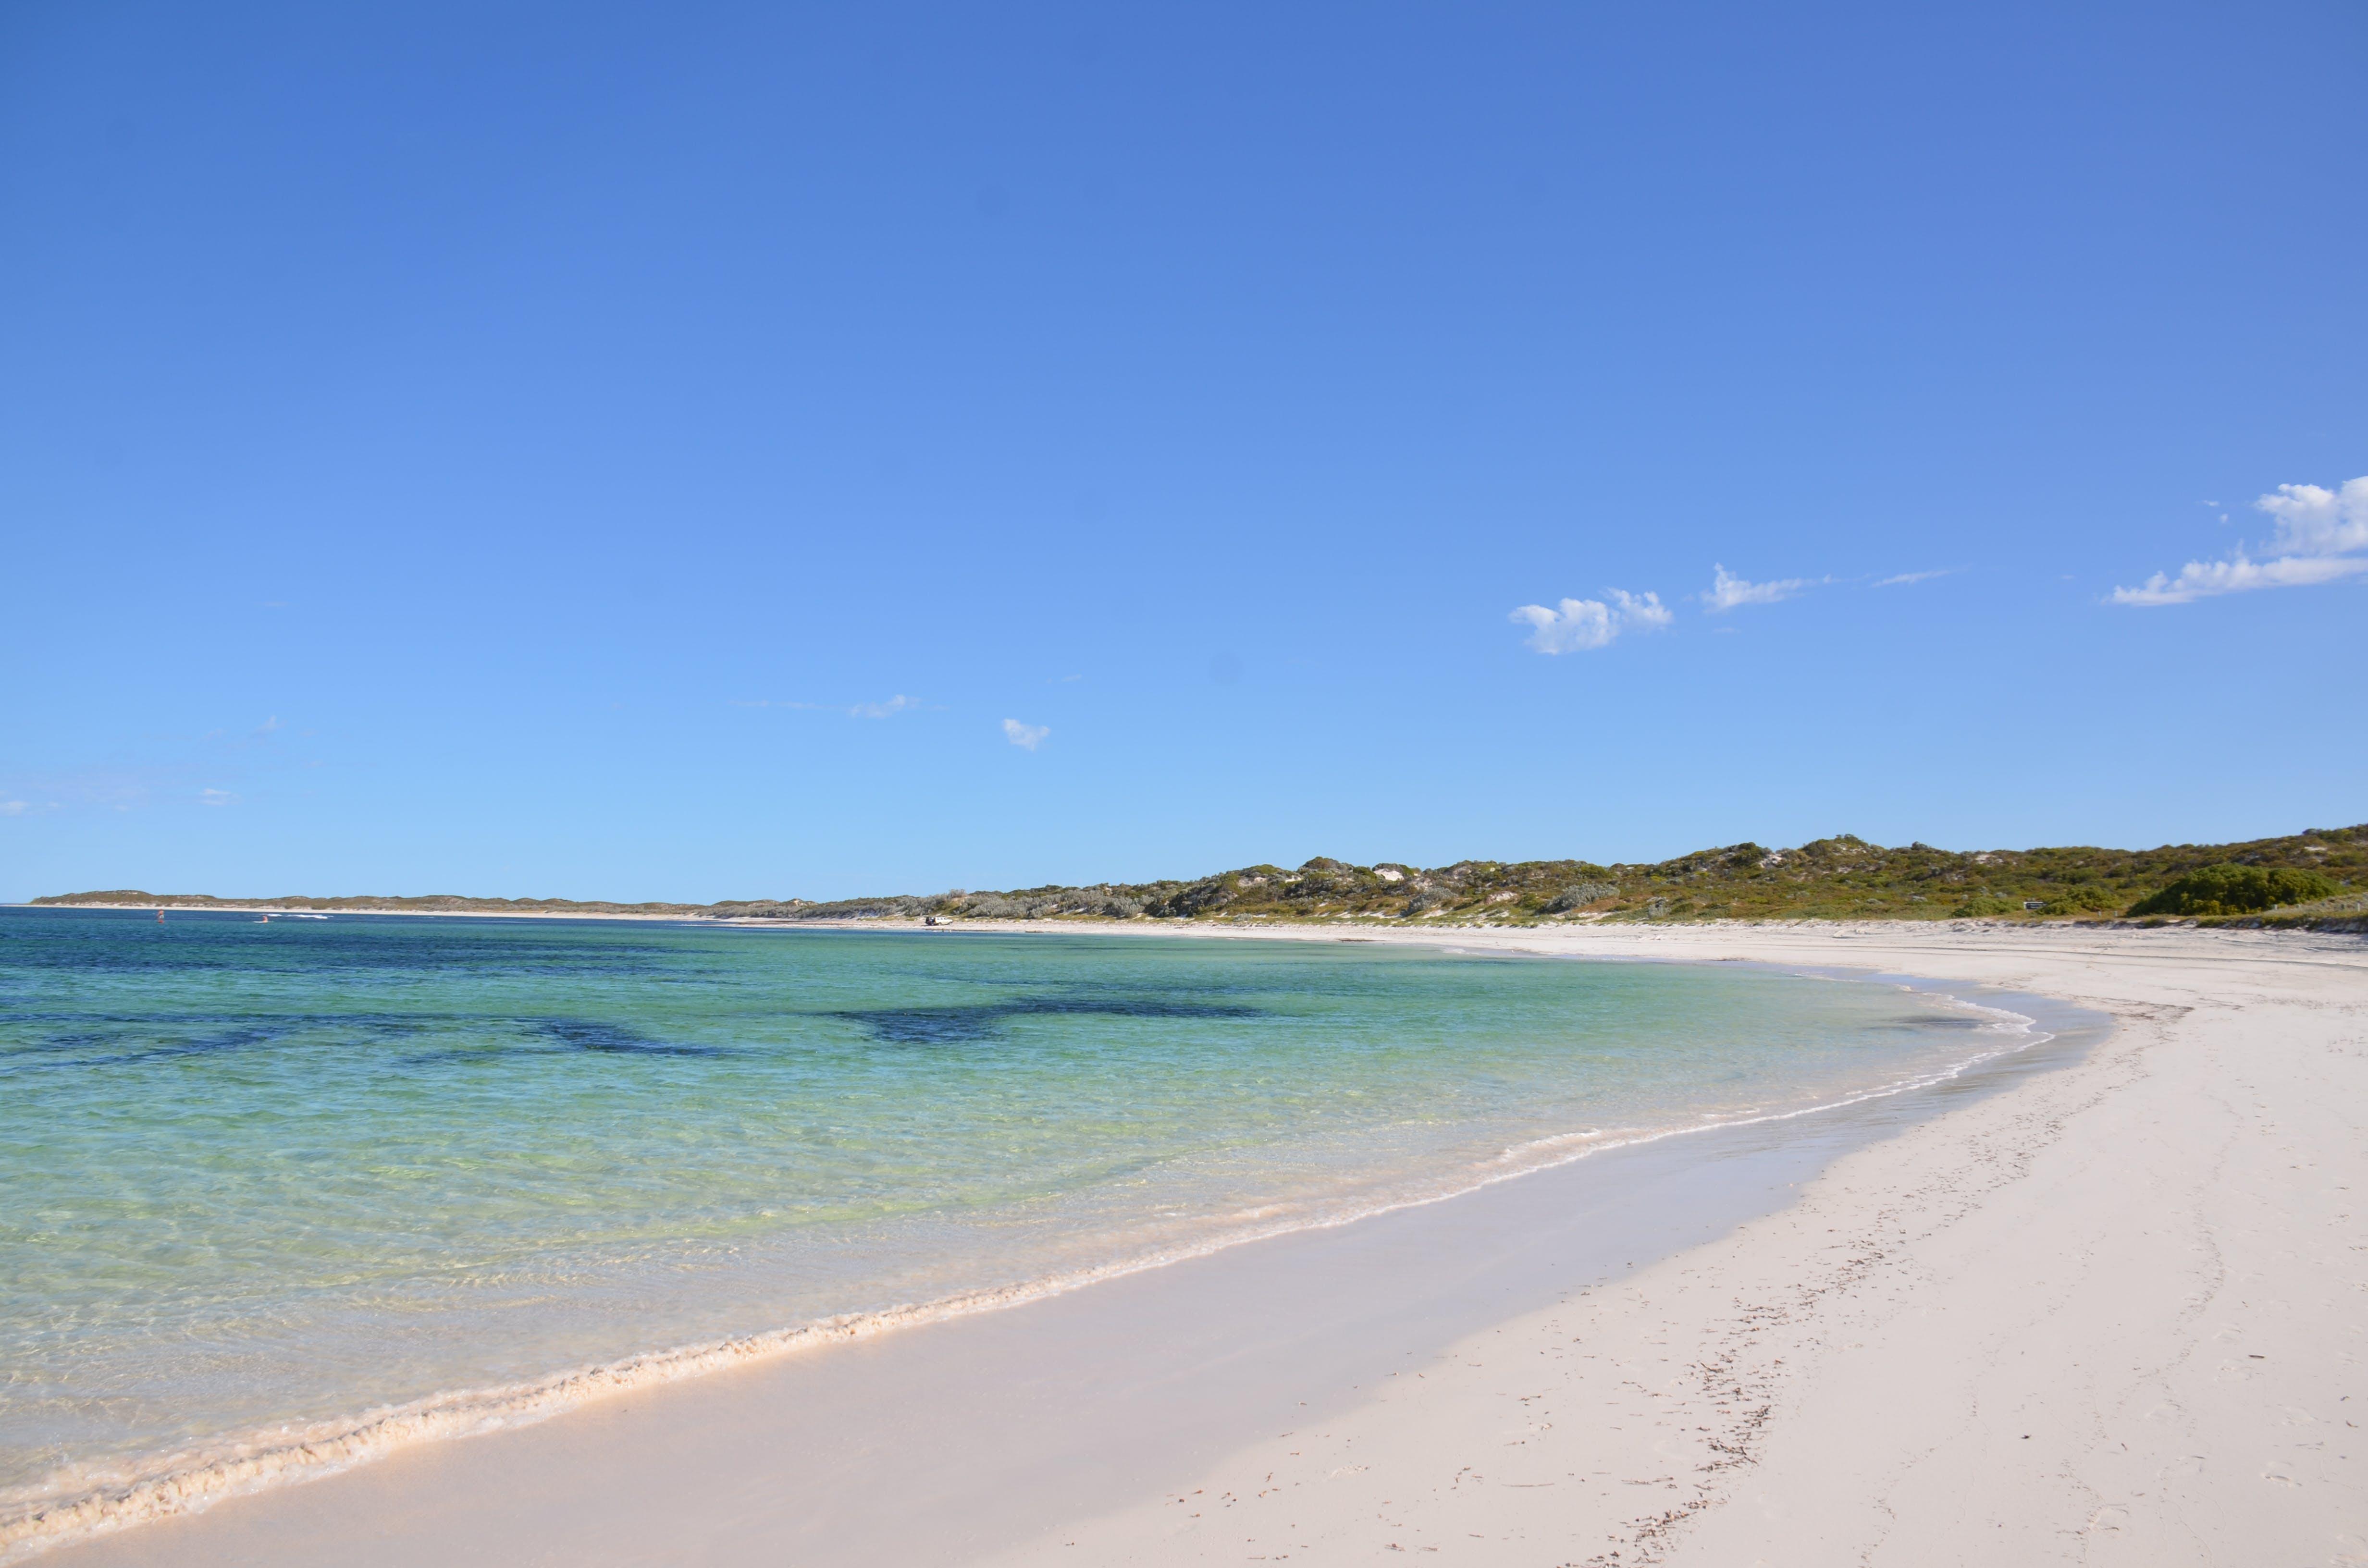 Free stock photo of hang over bay western australia, wide sweep of sandy beach